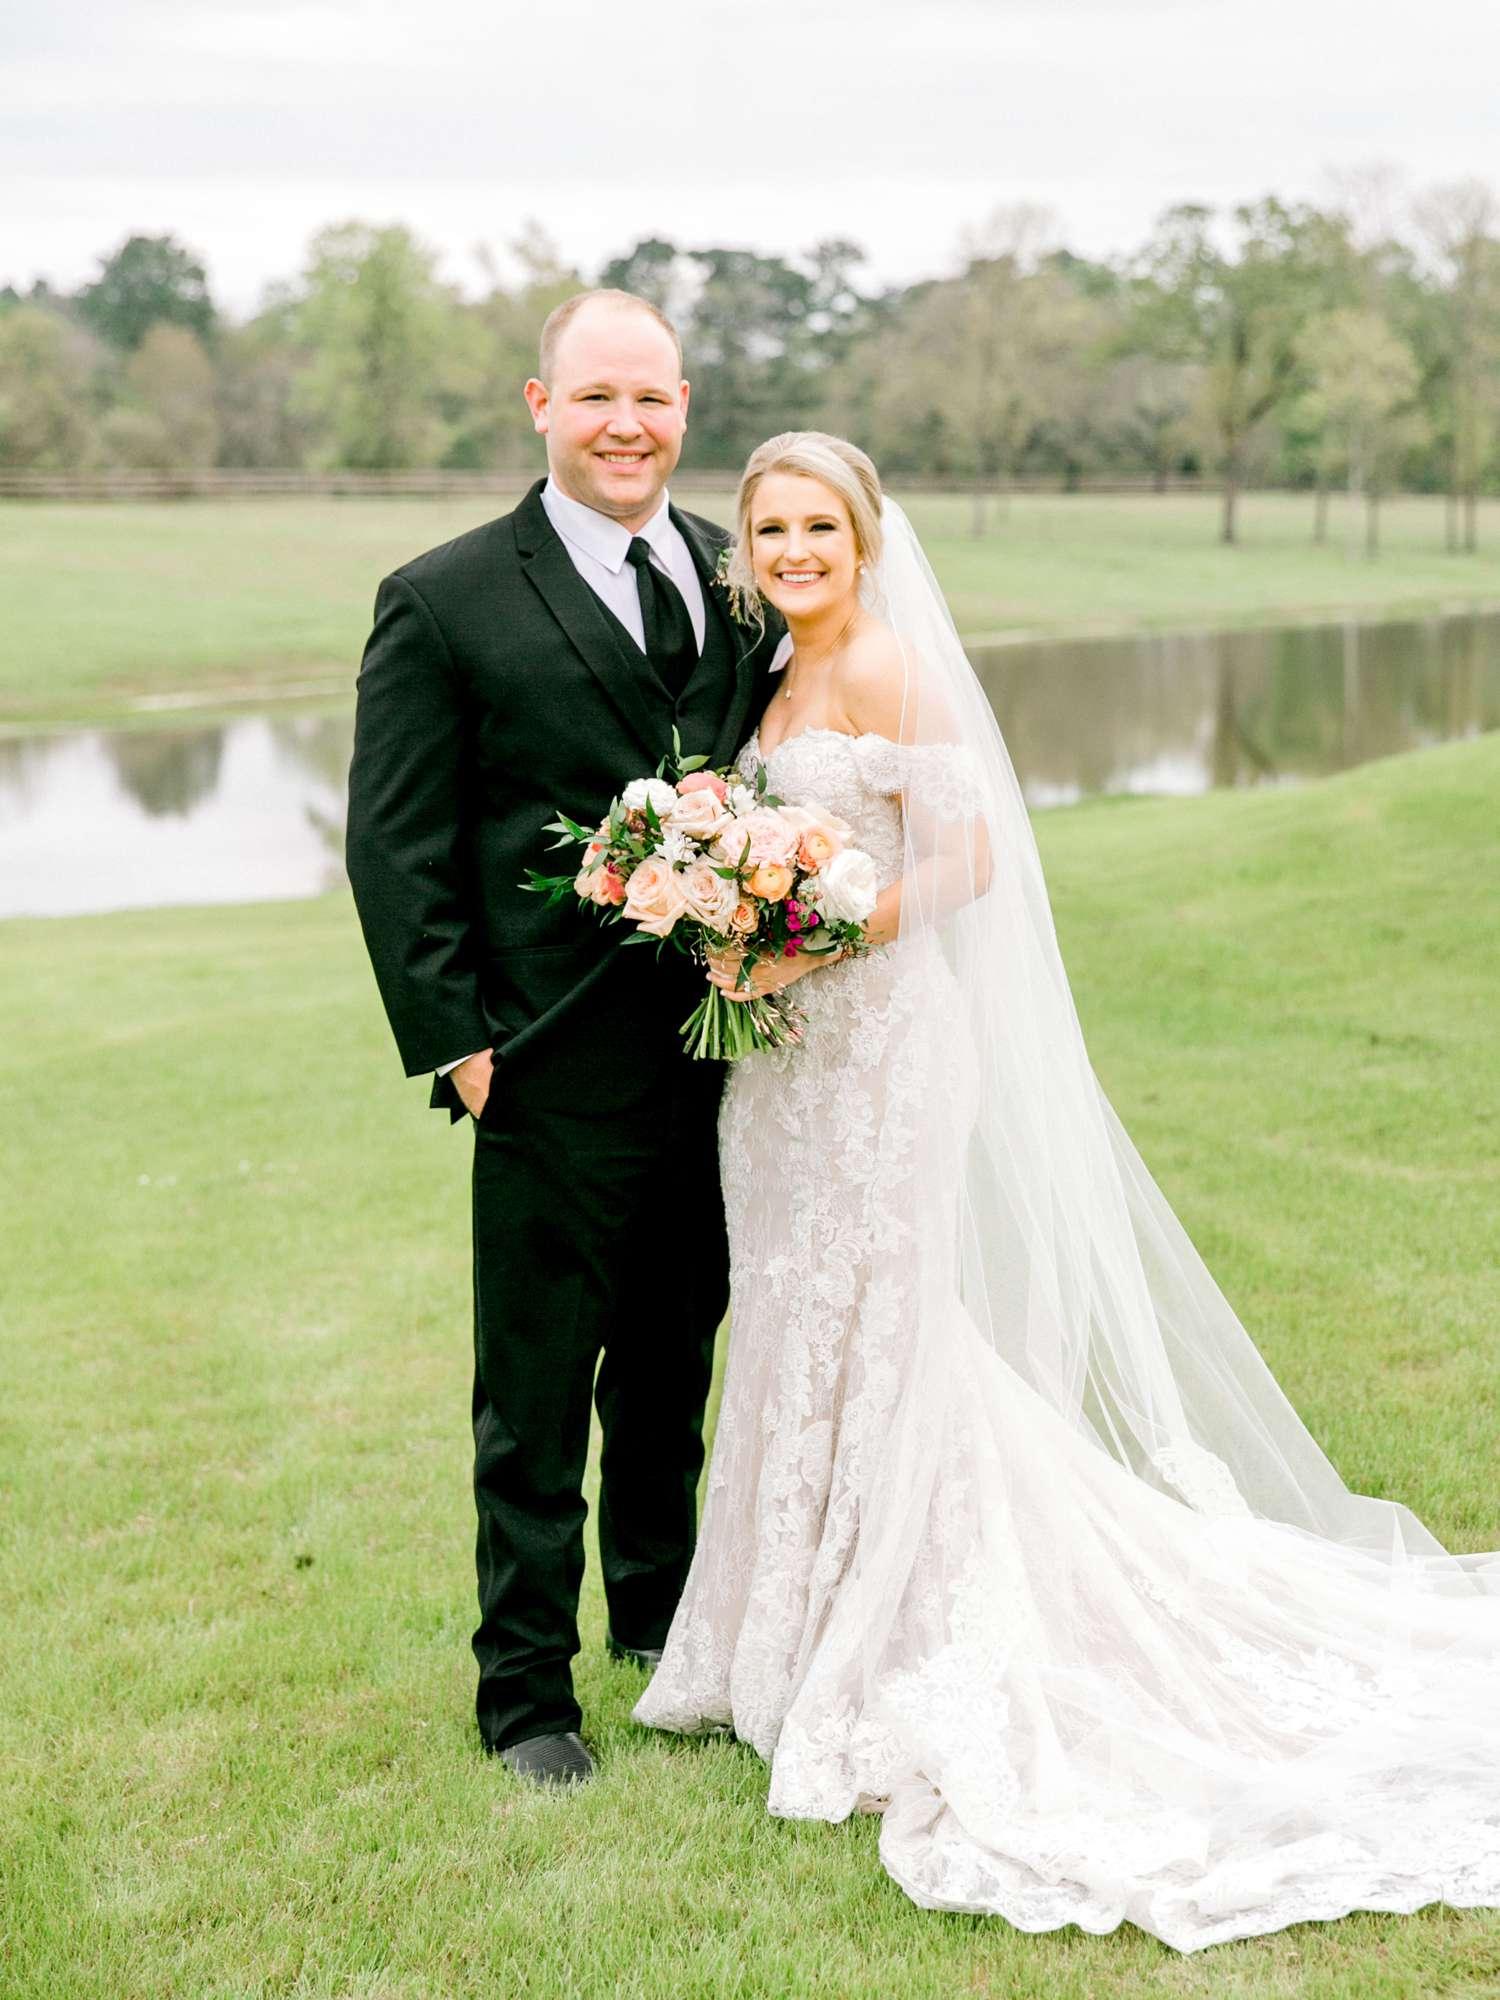 HEBERT_MORGAN_AND_CLAY_ALLEEJ_THE_FARMHOUSE_MONTGOMERY_TEXAS_WEDDING_0131.jpg